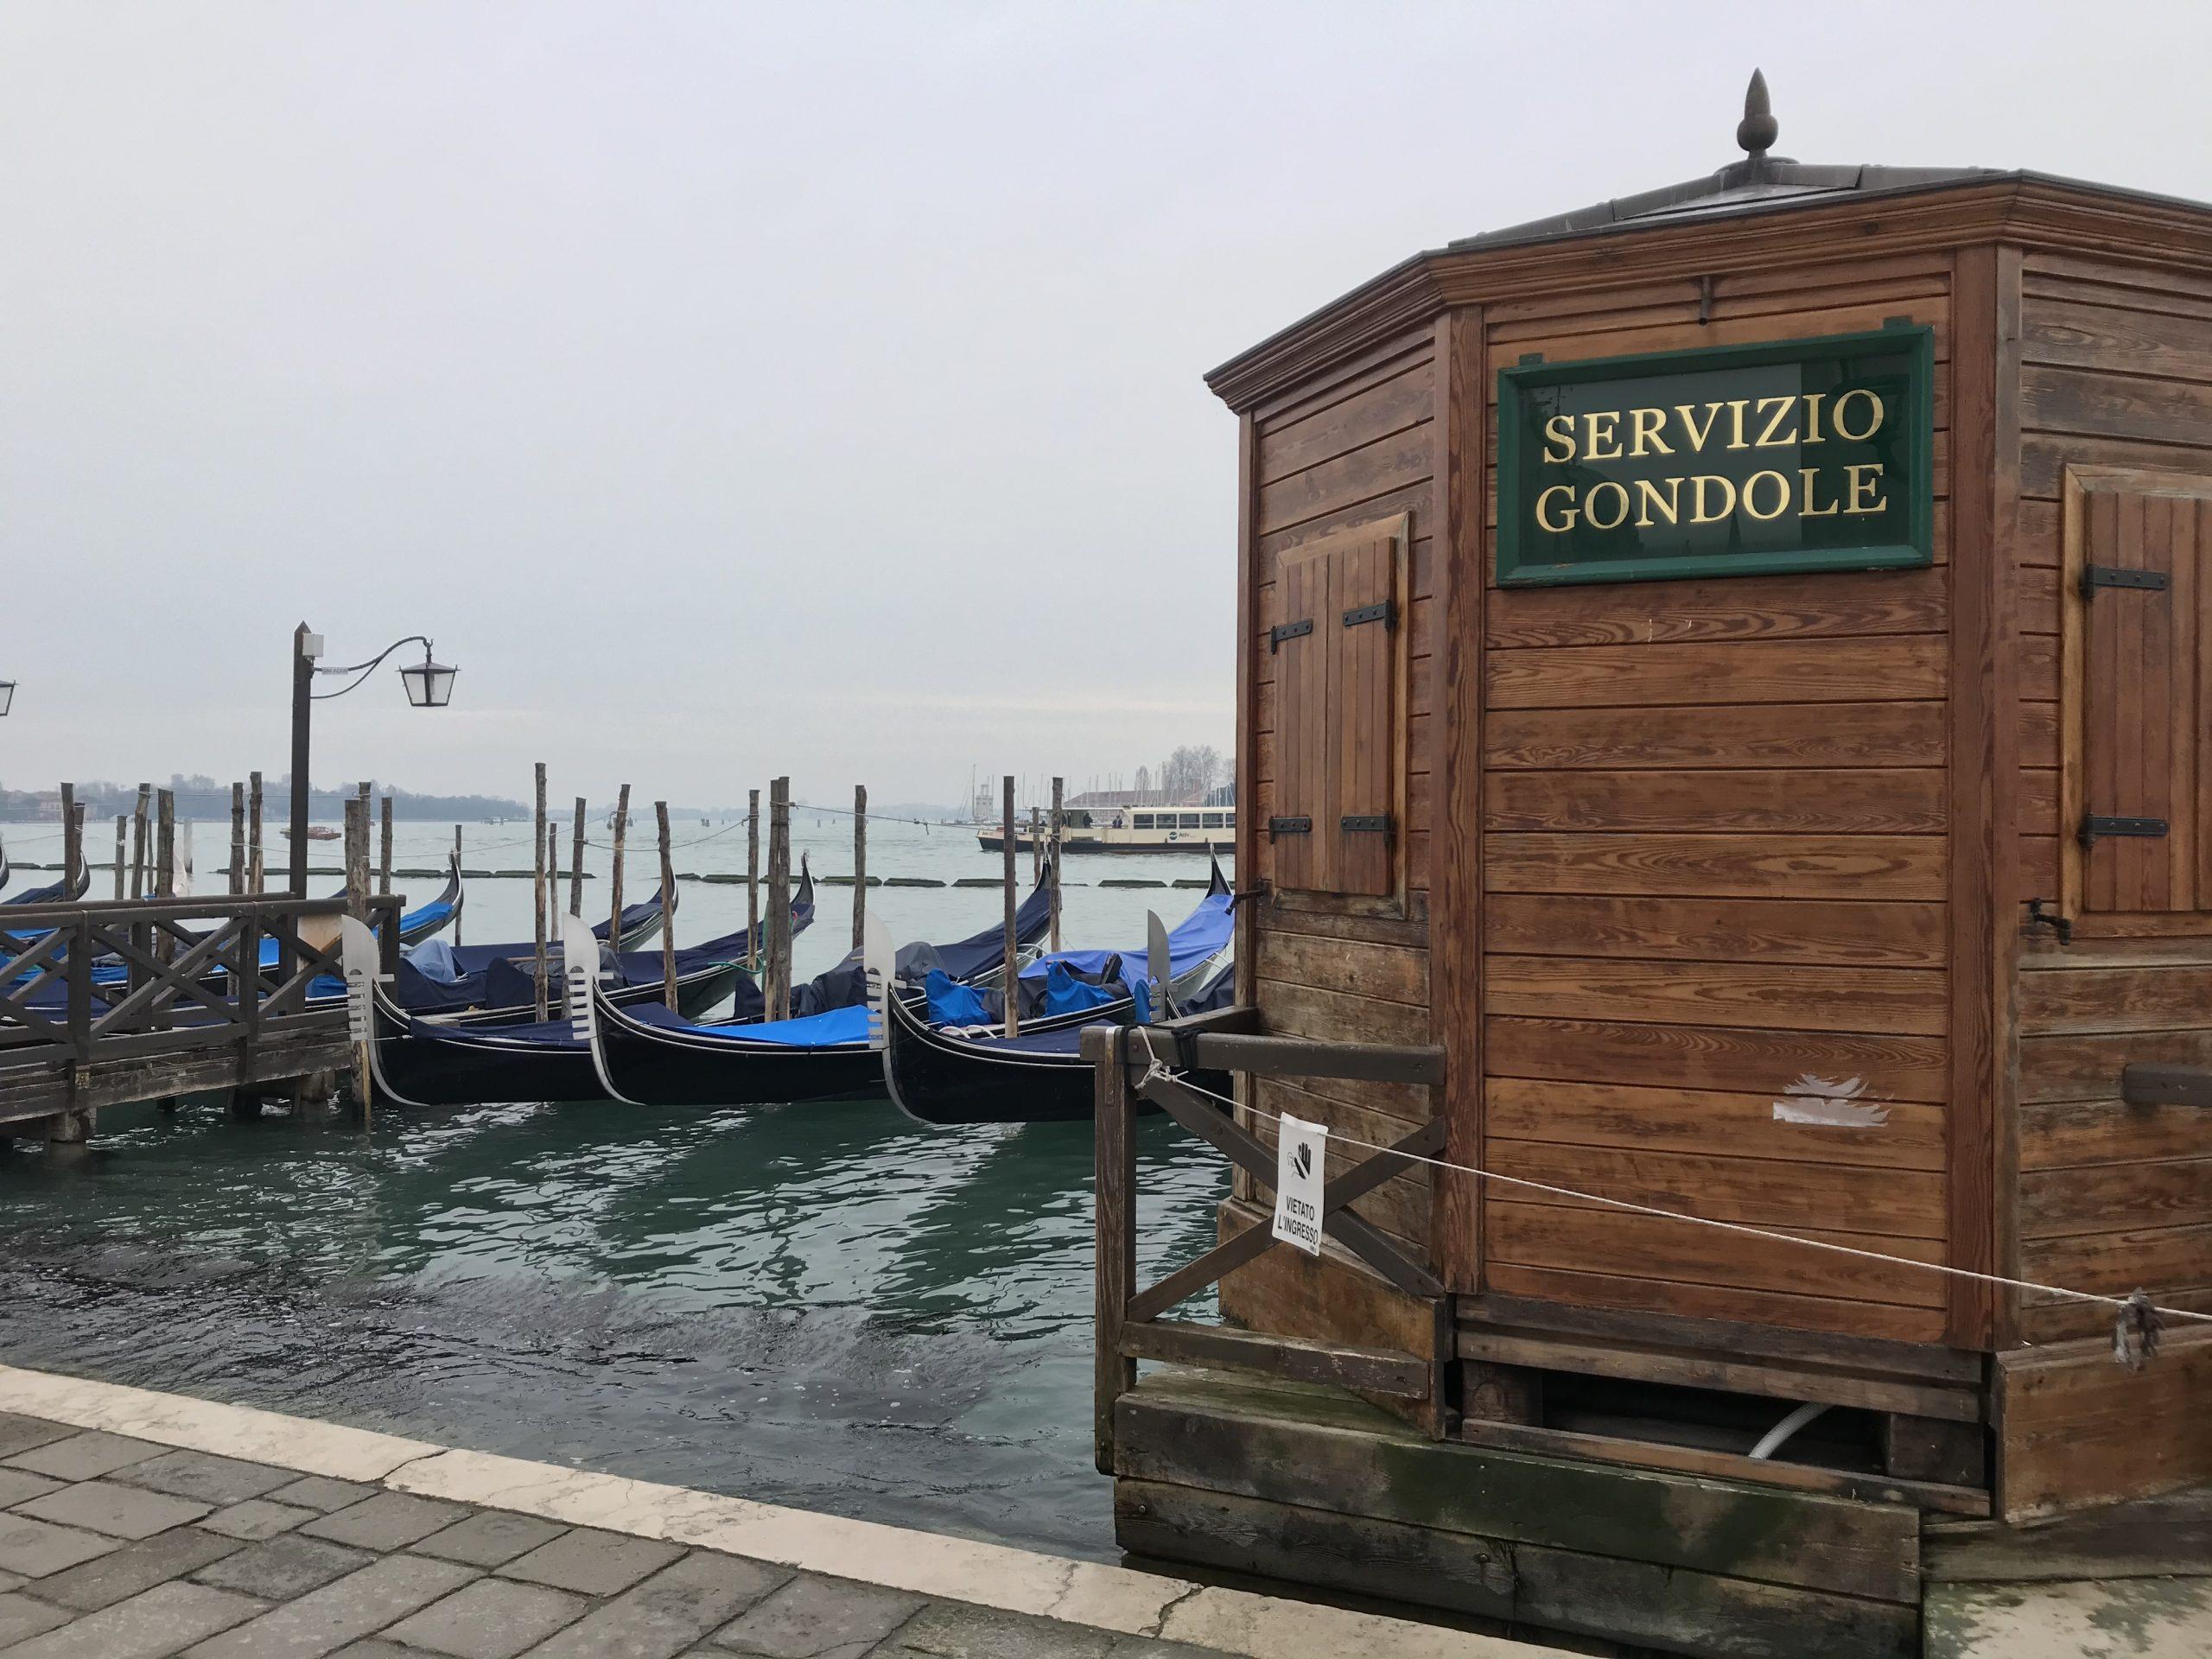 venetian gondolas without people